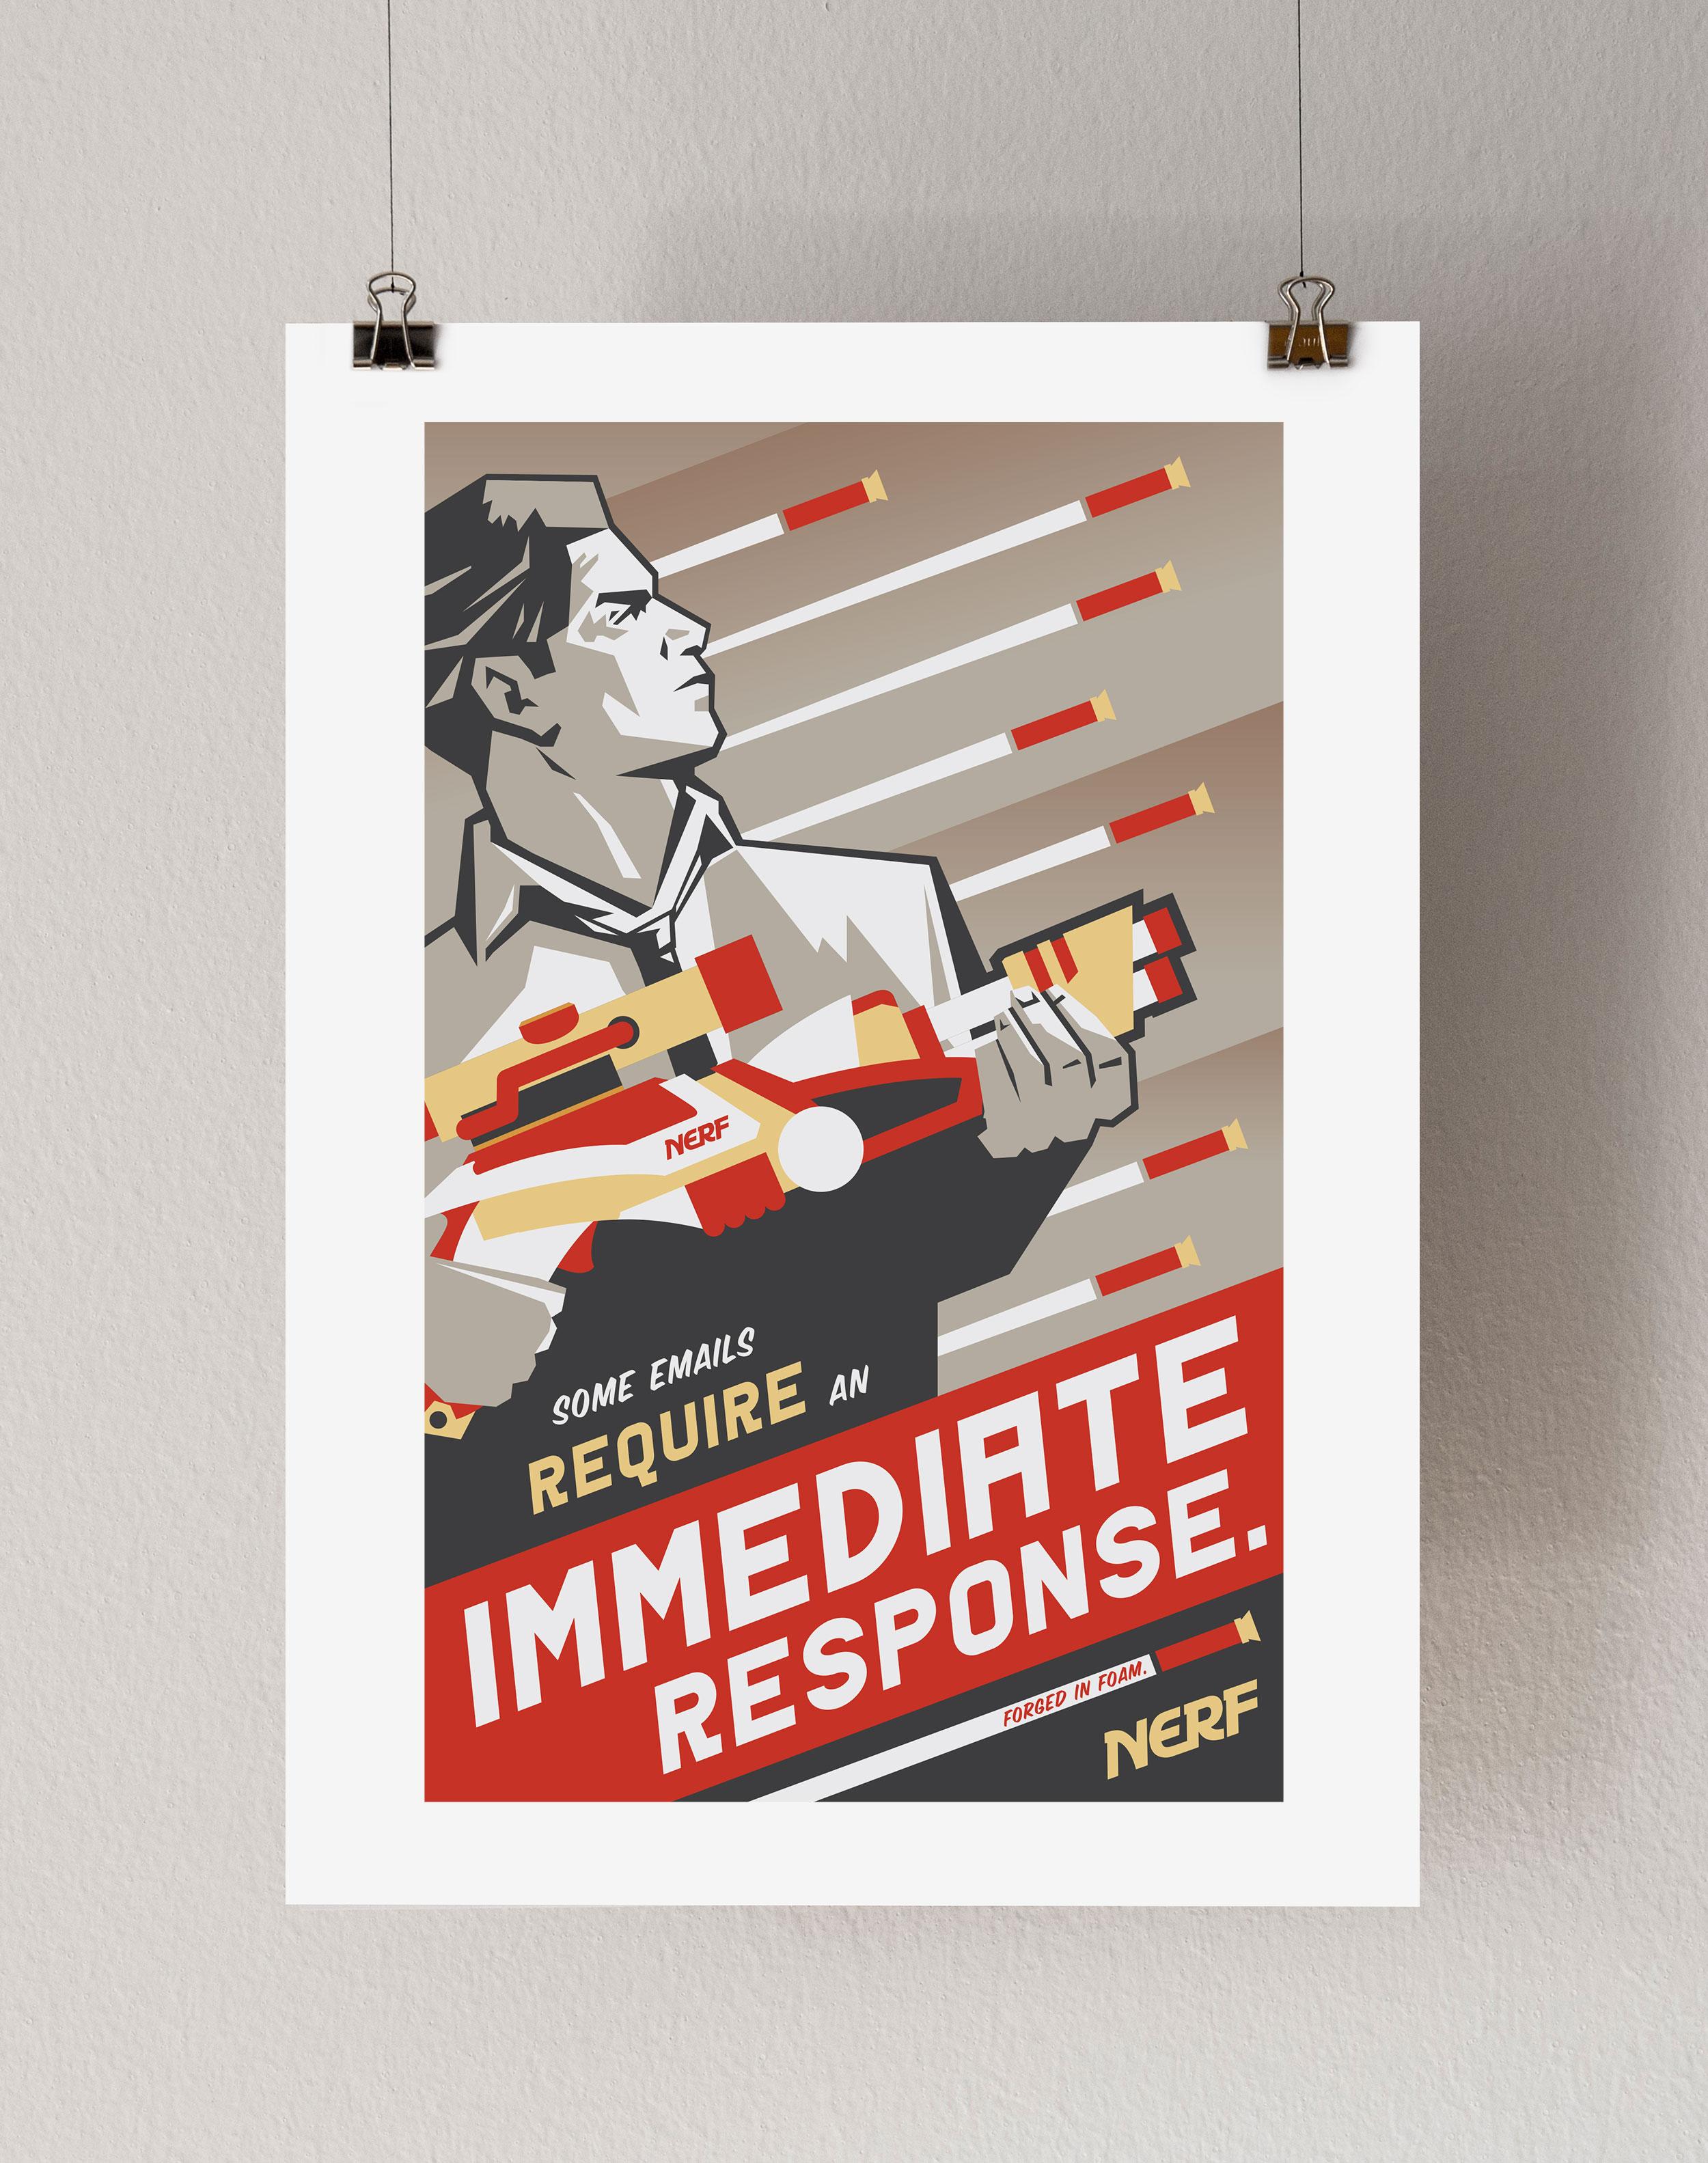 Illustrations_Posters_mockup_nerf1.jpg